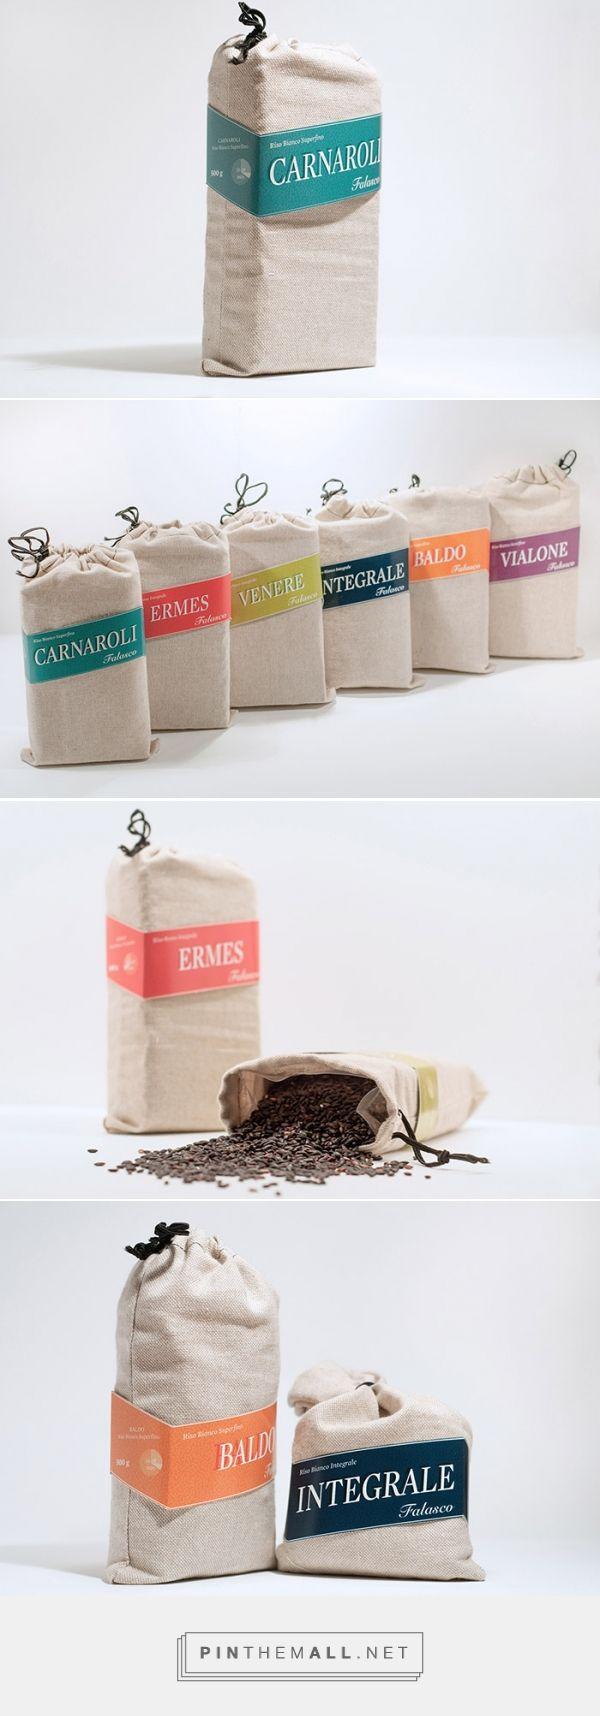 Falasco - Rice Packaging Designed by Giorgio Mastropasqua